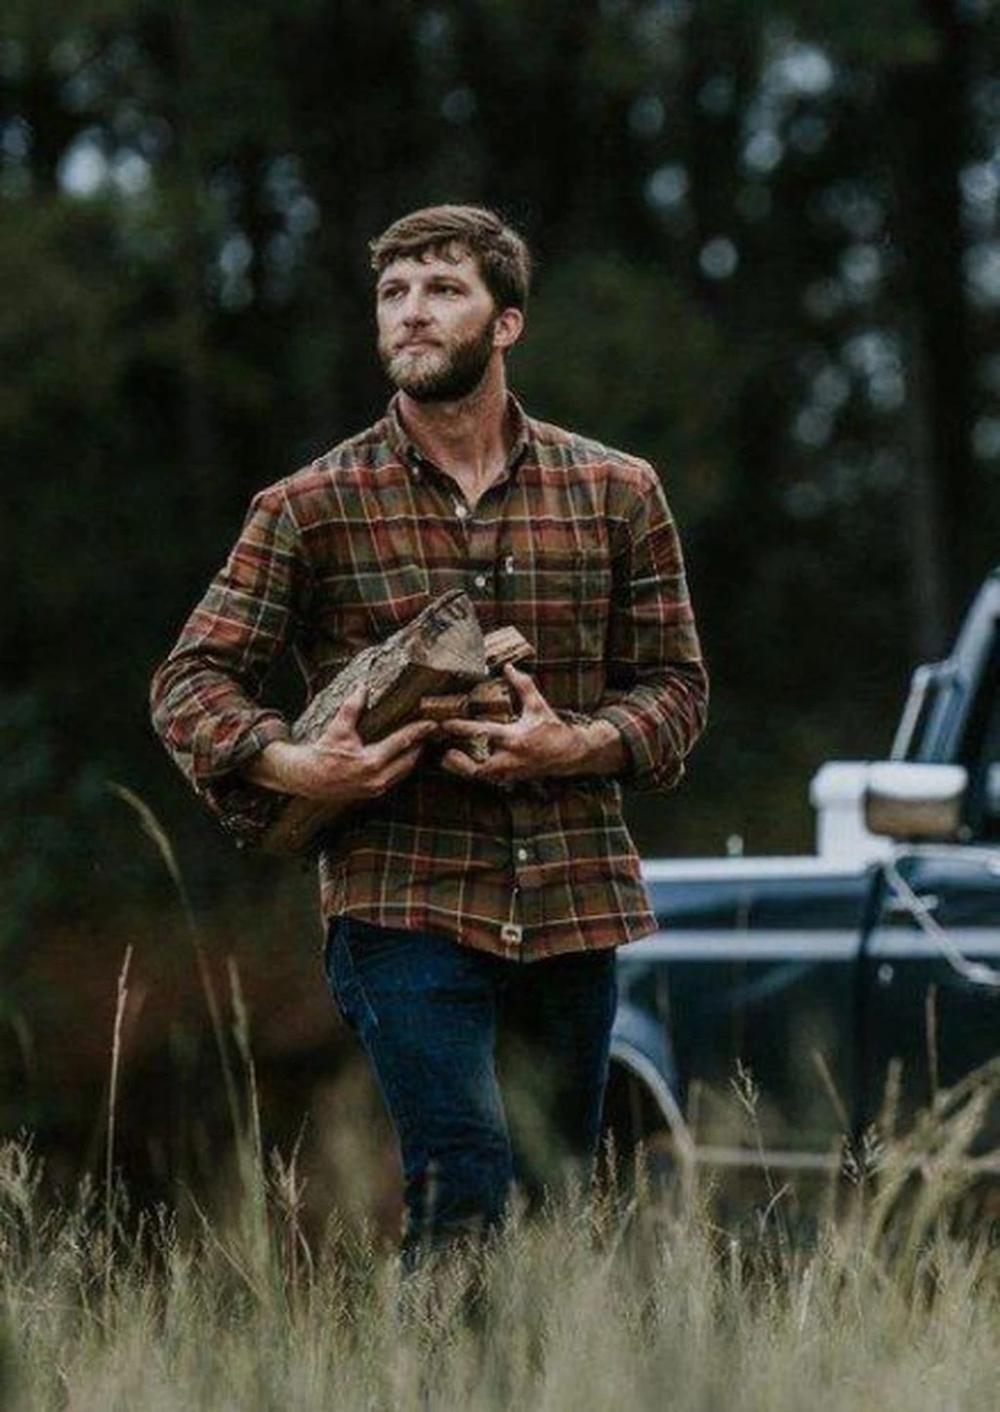 Men Classic Plaid Lapel Shirt In 2020 Flannel Outfits Men Mens Flannel Shirt How To Wear Flannels